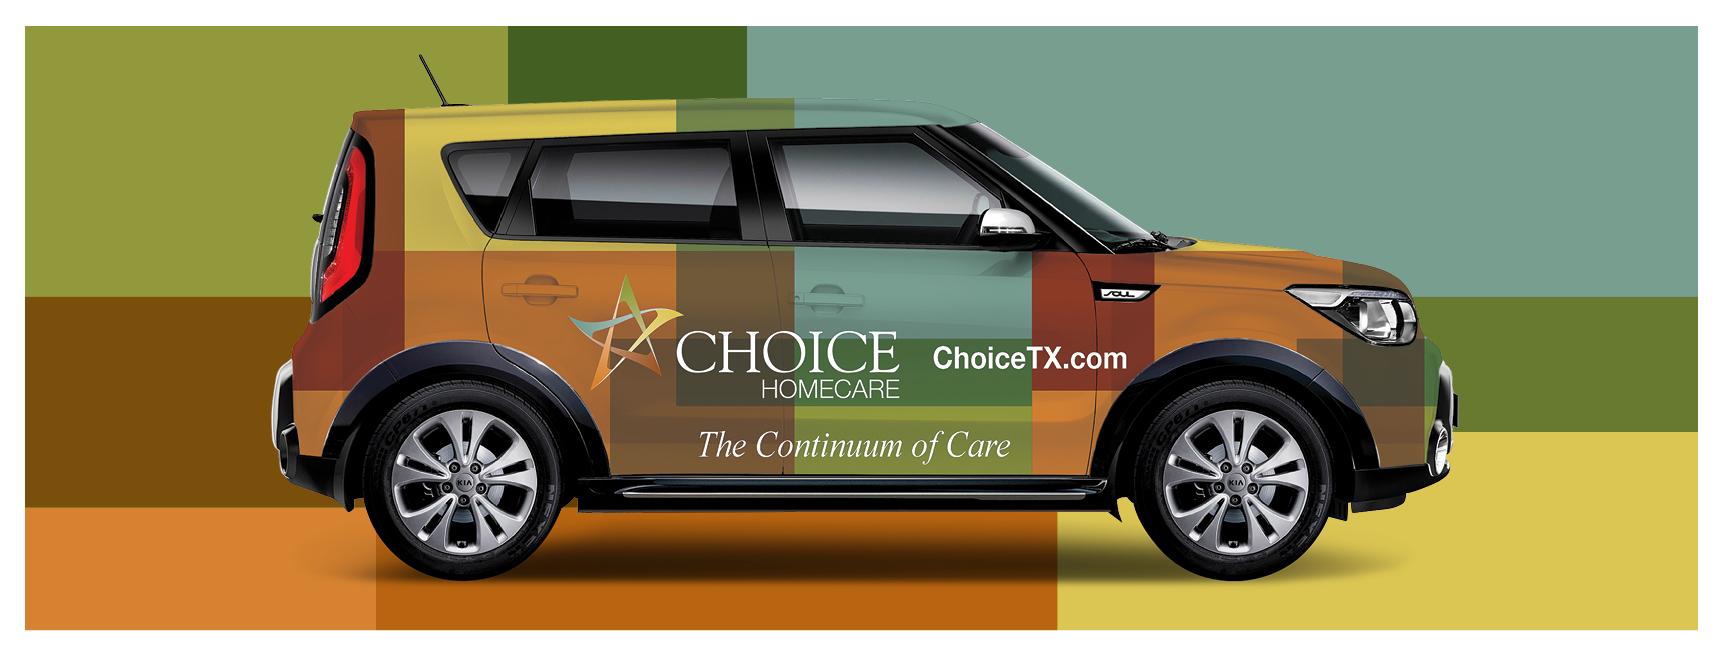 home health Jasper TX, home health Kountze, Home health Woodville TX, home health Buna